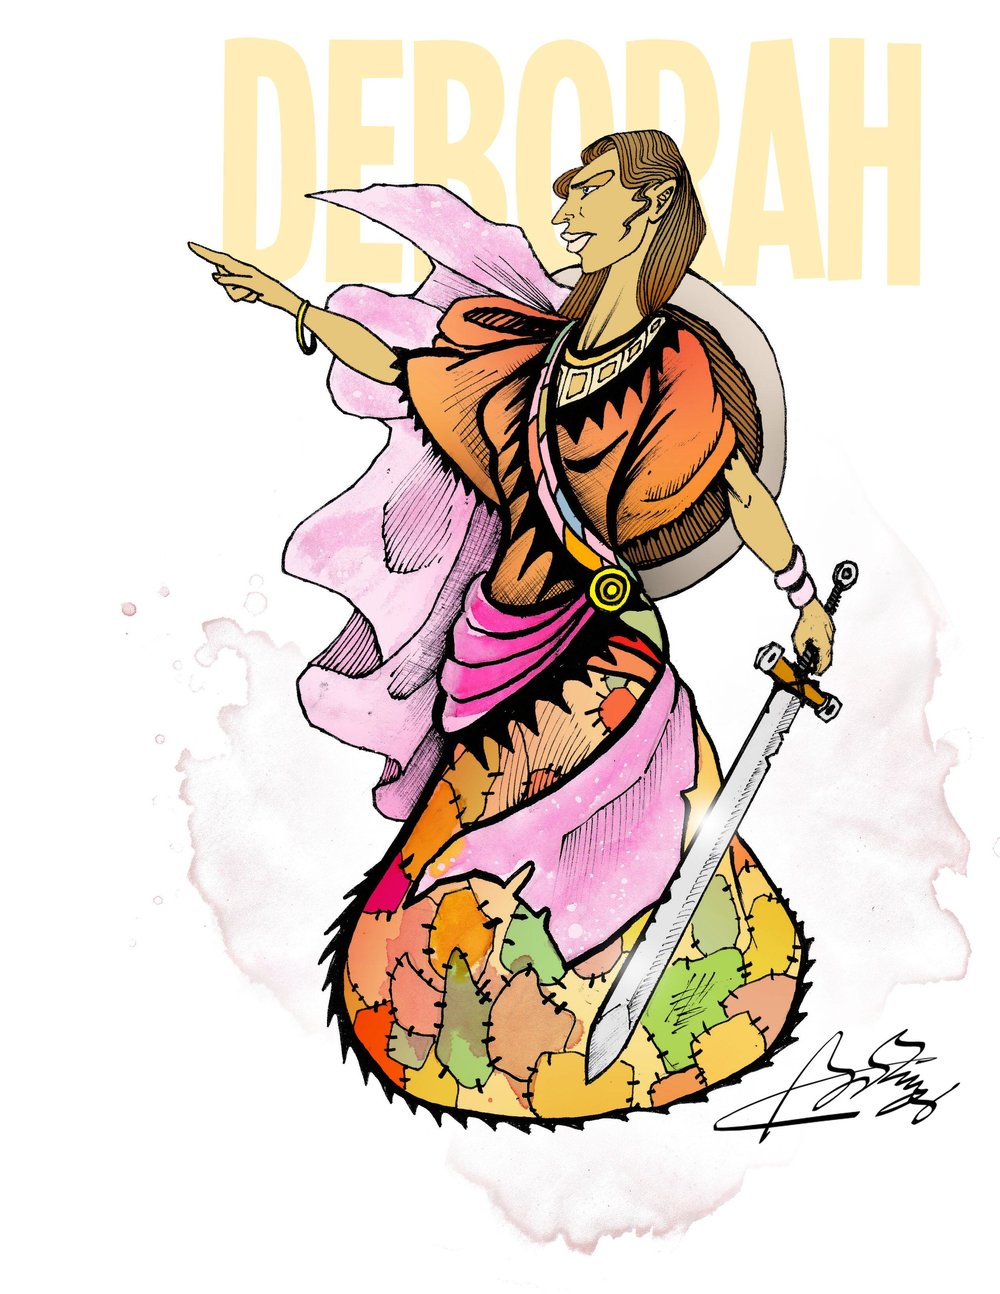 Deborah - A Judge and ProphetessJudges 4:1-24Song of DeborahJudges 5